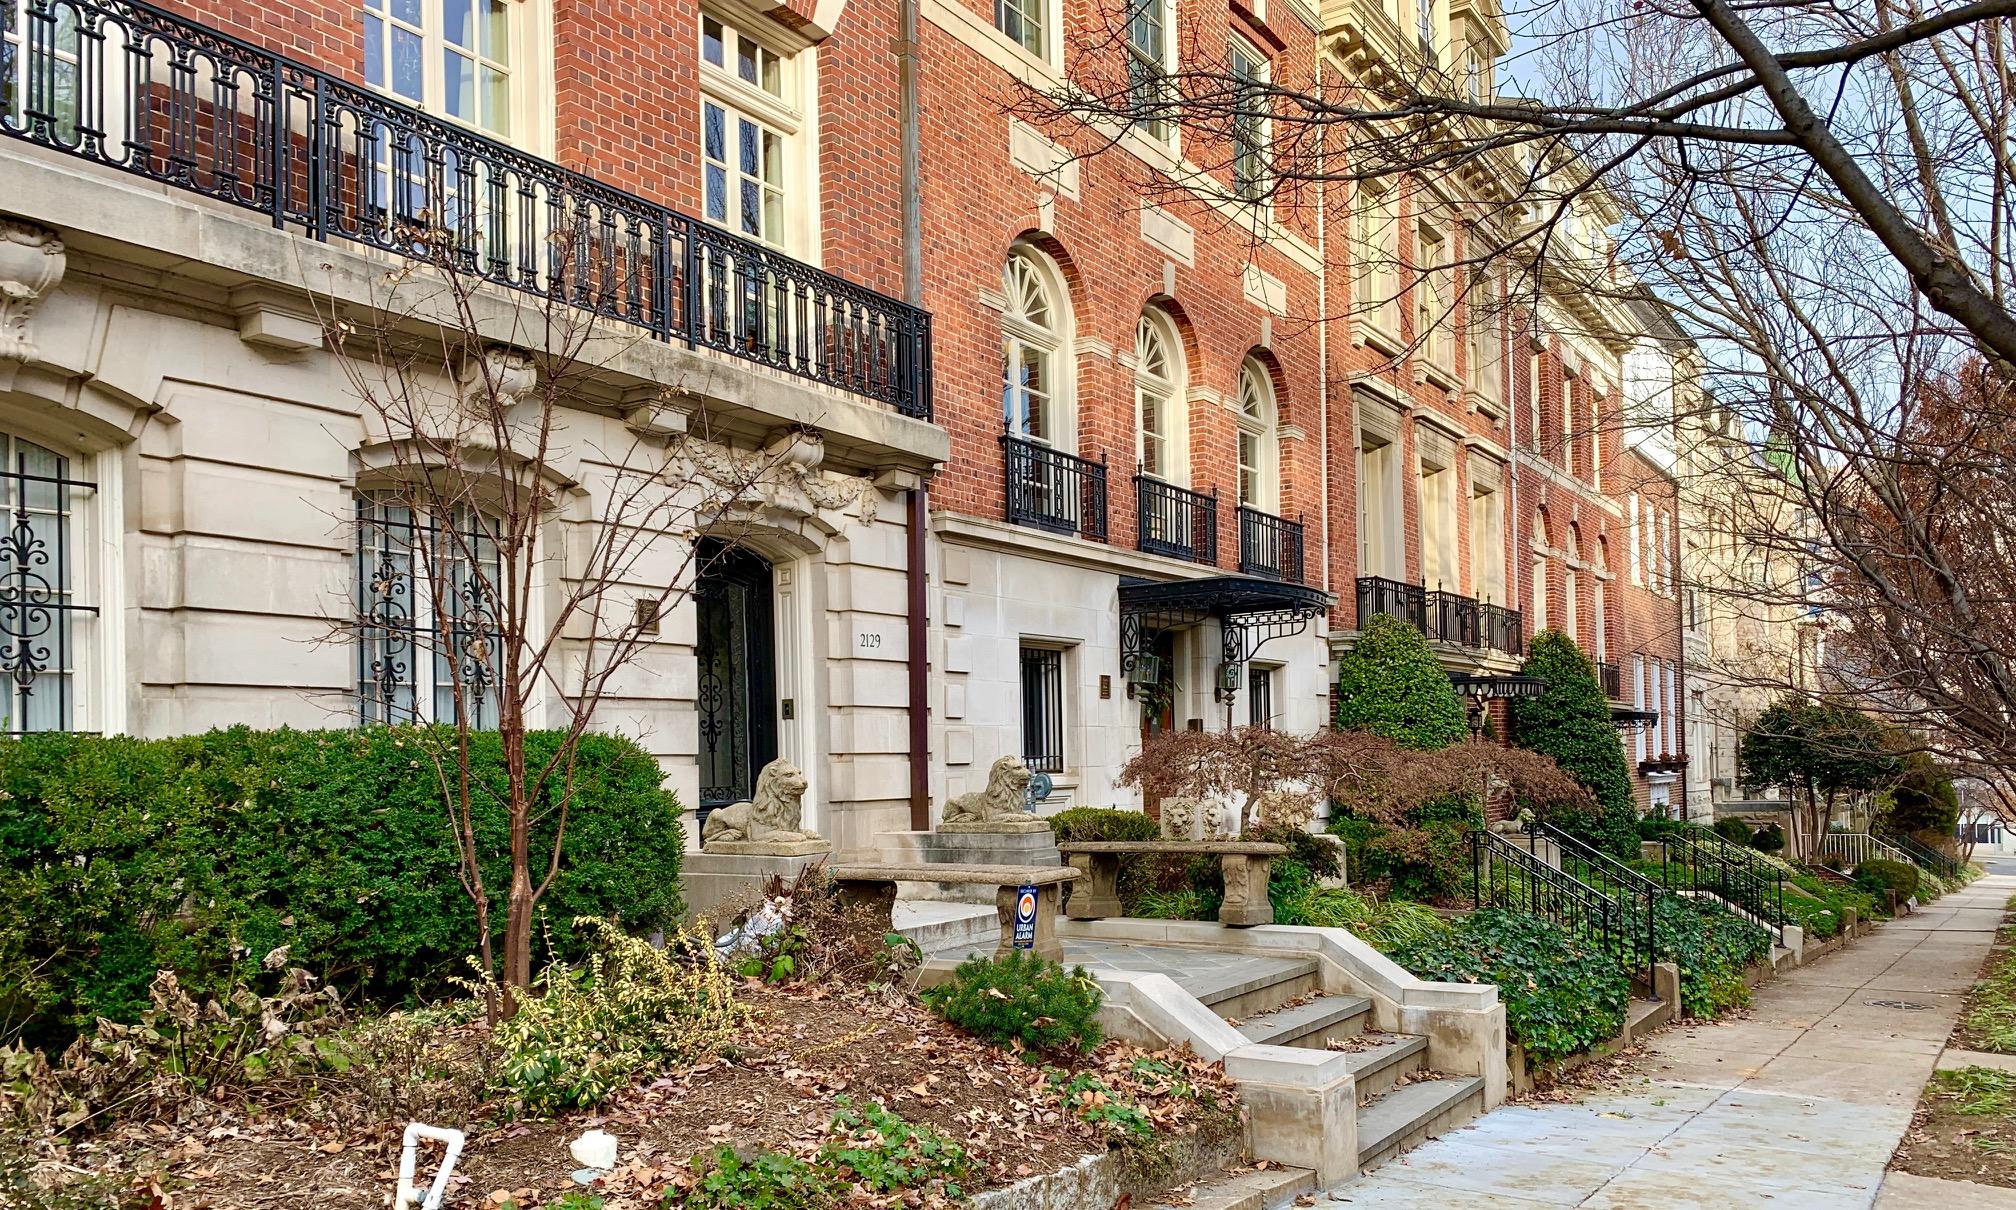 Washington, DC Semi Detached Homes. Bancroft Place NW in Kalorama